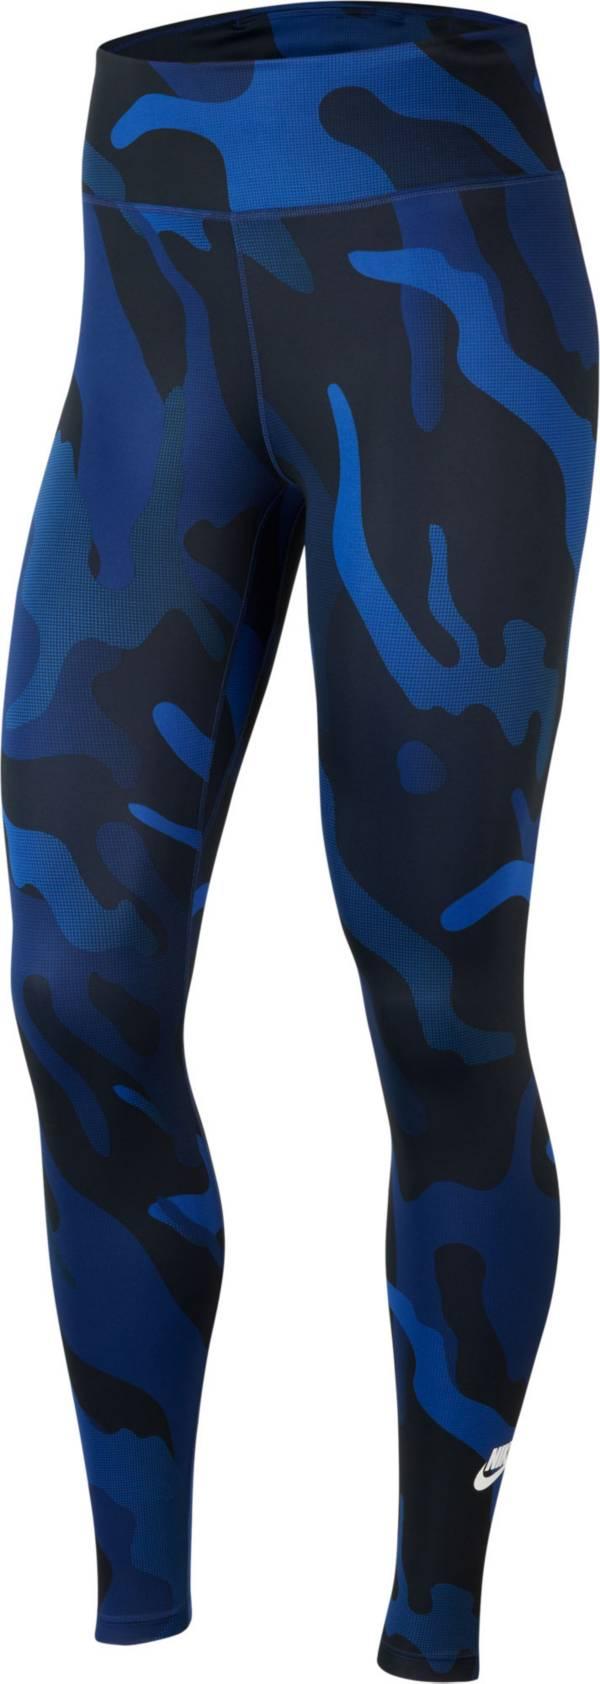 Nike Women's U.S. Soccer Training Tights product image